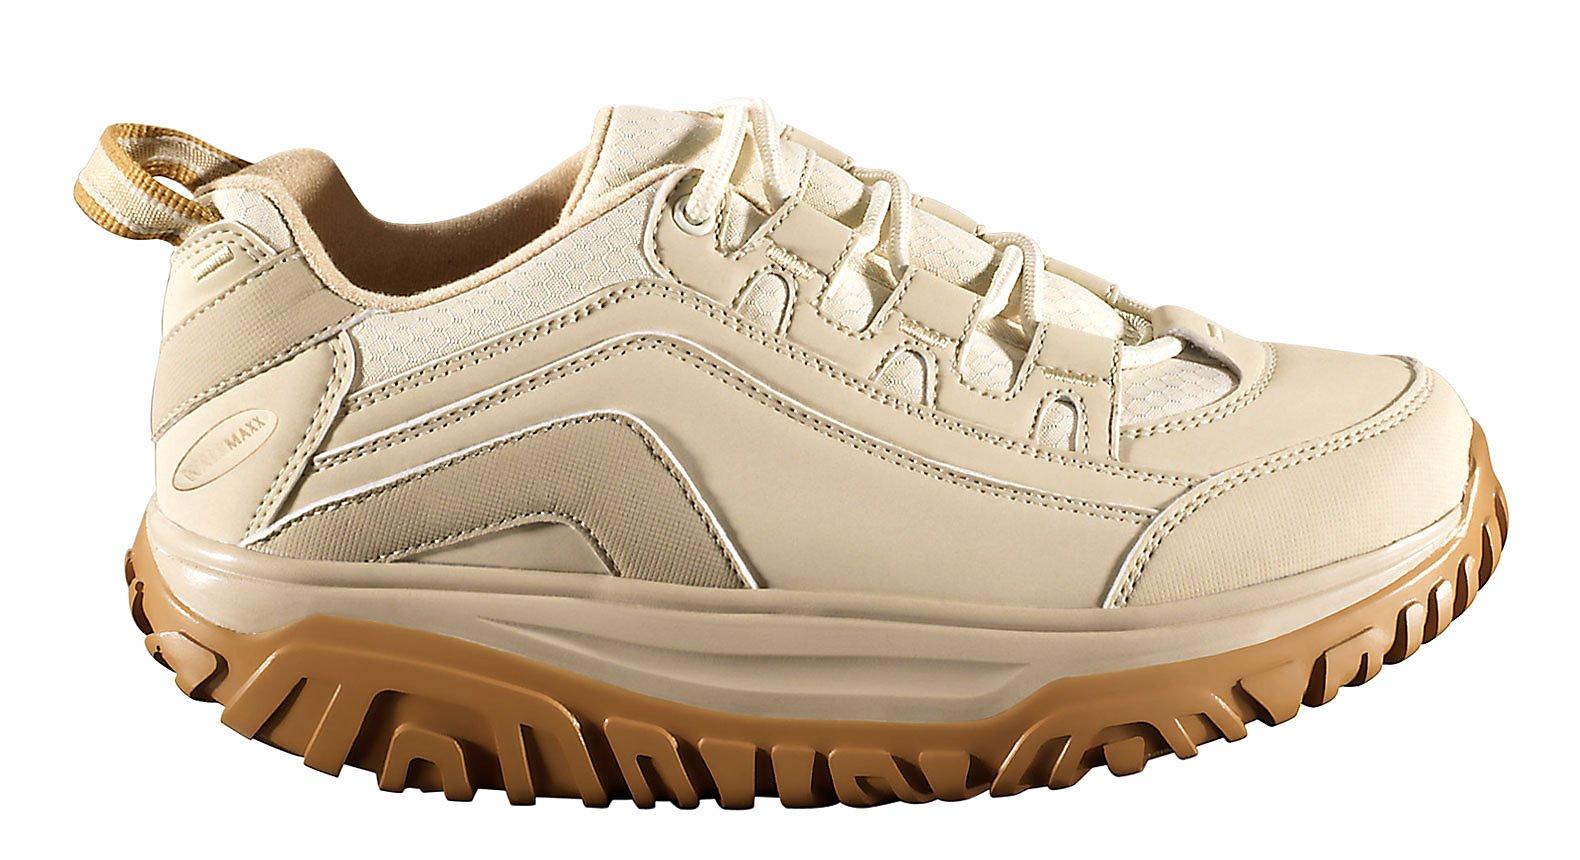 reputable site 599d7 86718 WalkMaxx Outdoor-Fitness-Schuh, beige Größe: 37 | Weltbild.de